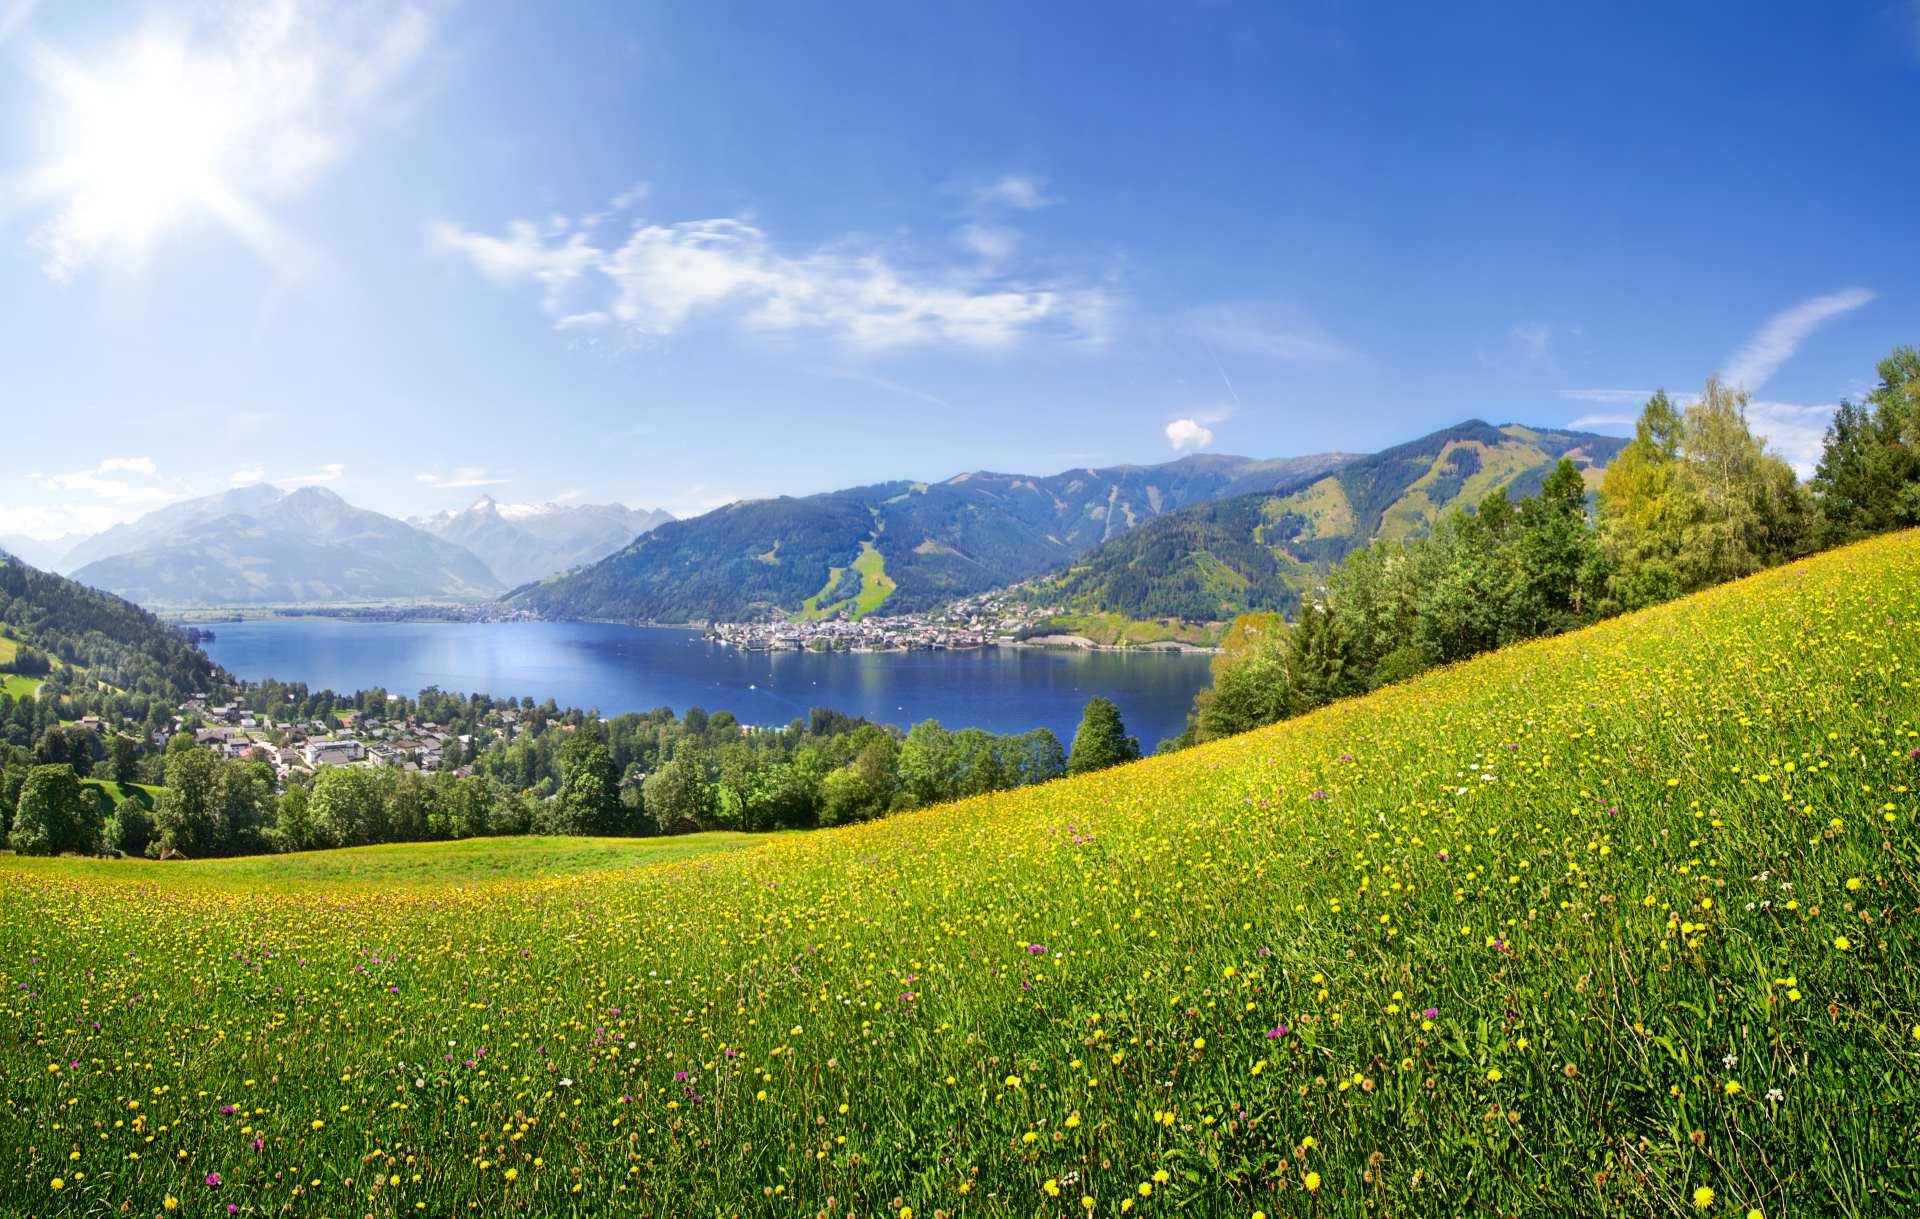 Sfeerimpressie zonvakantie Zwitserland